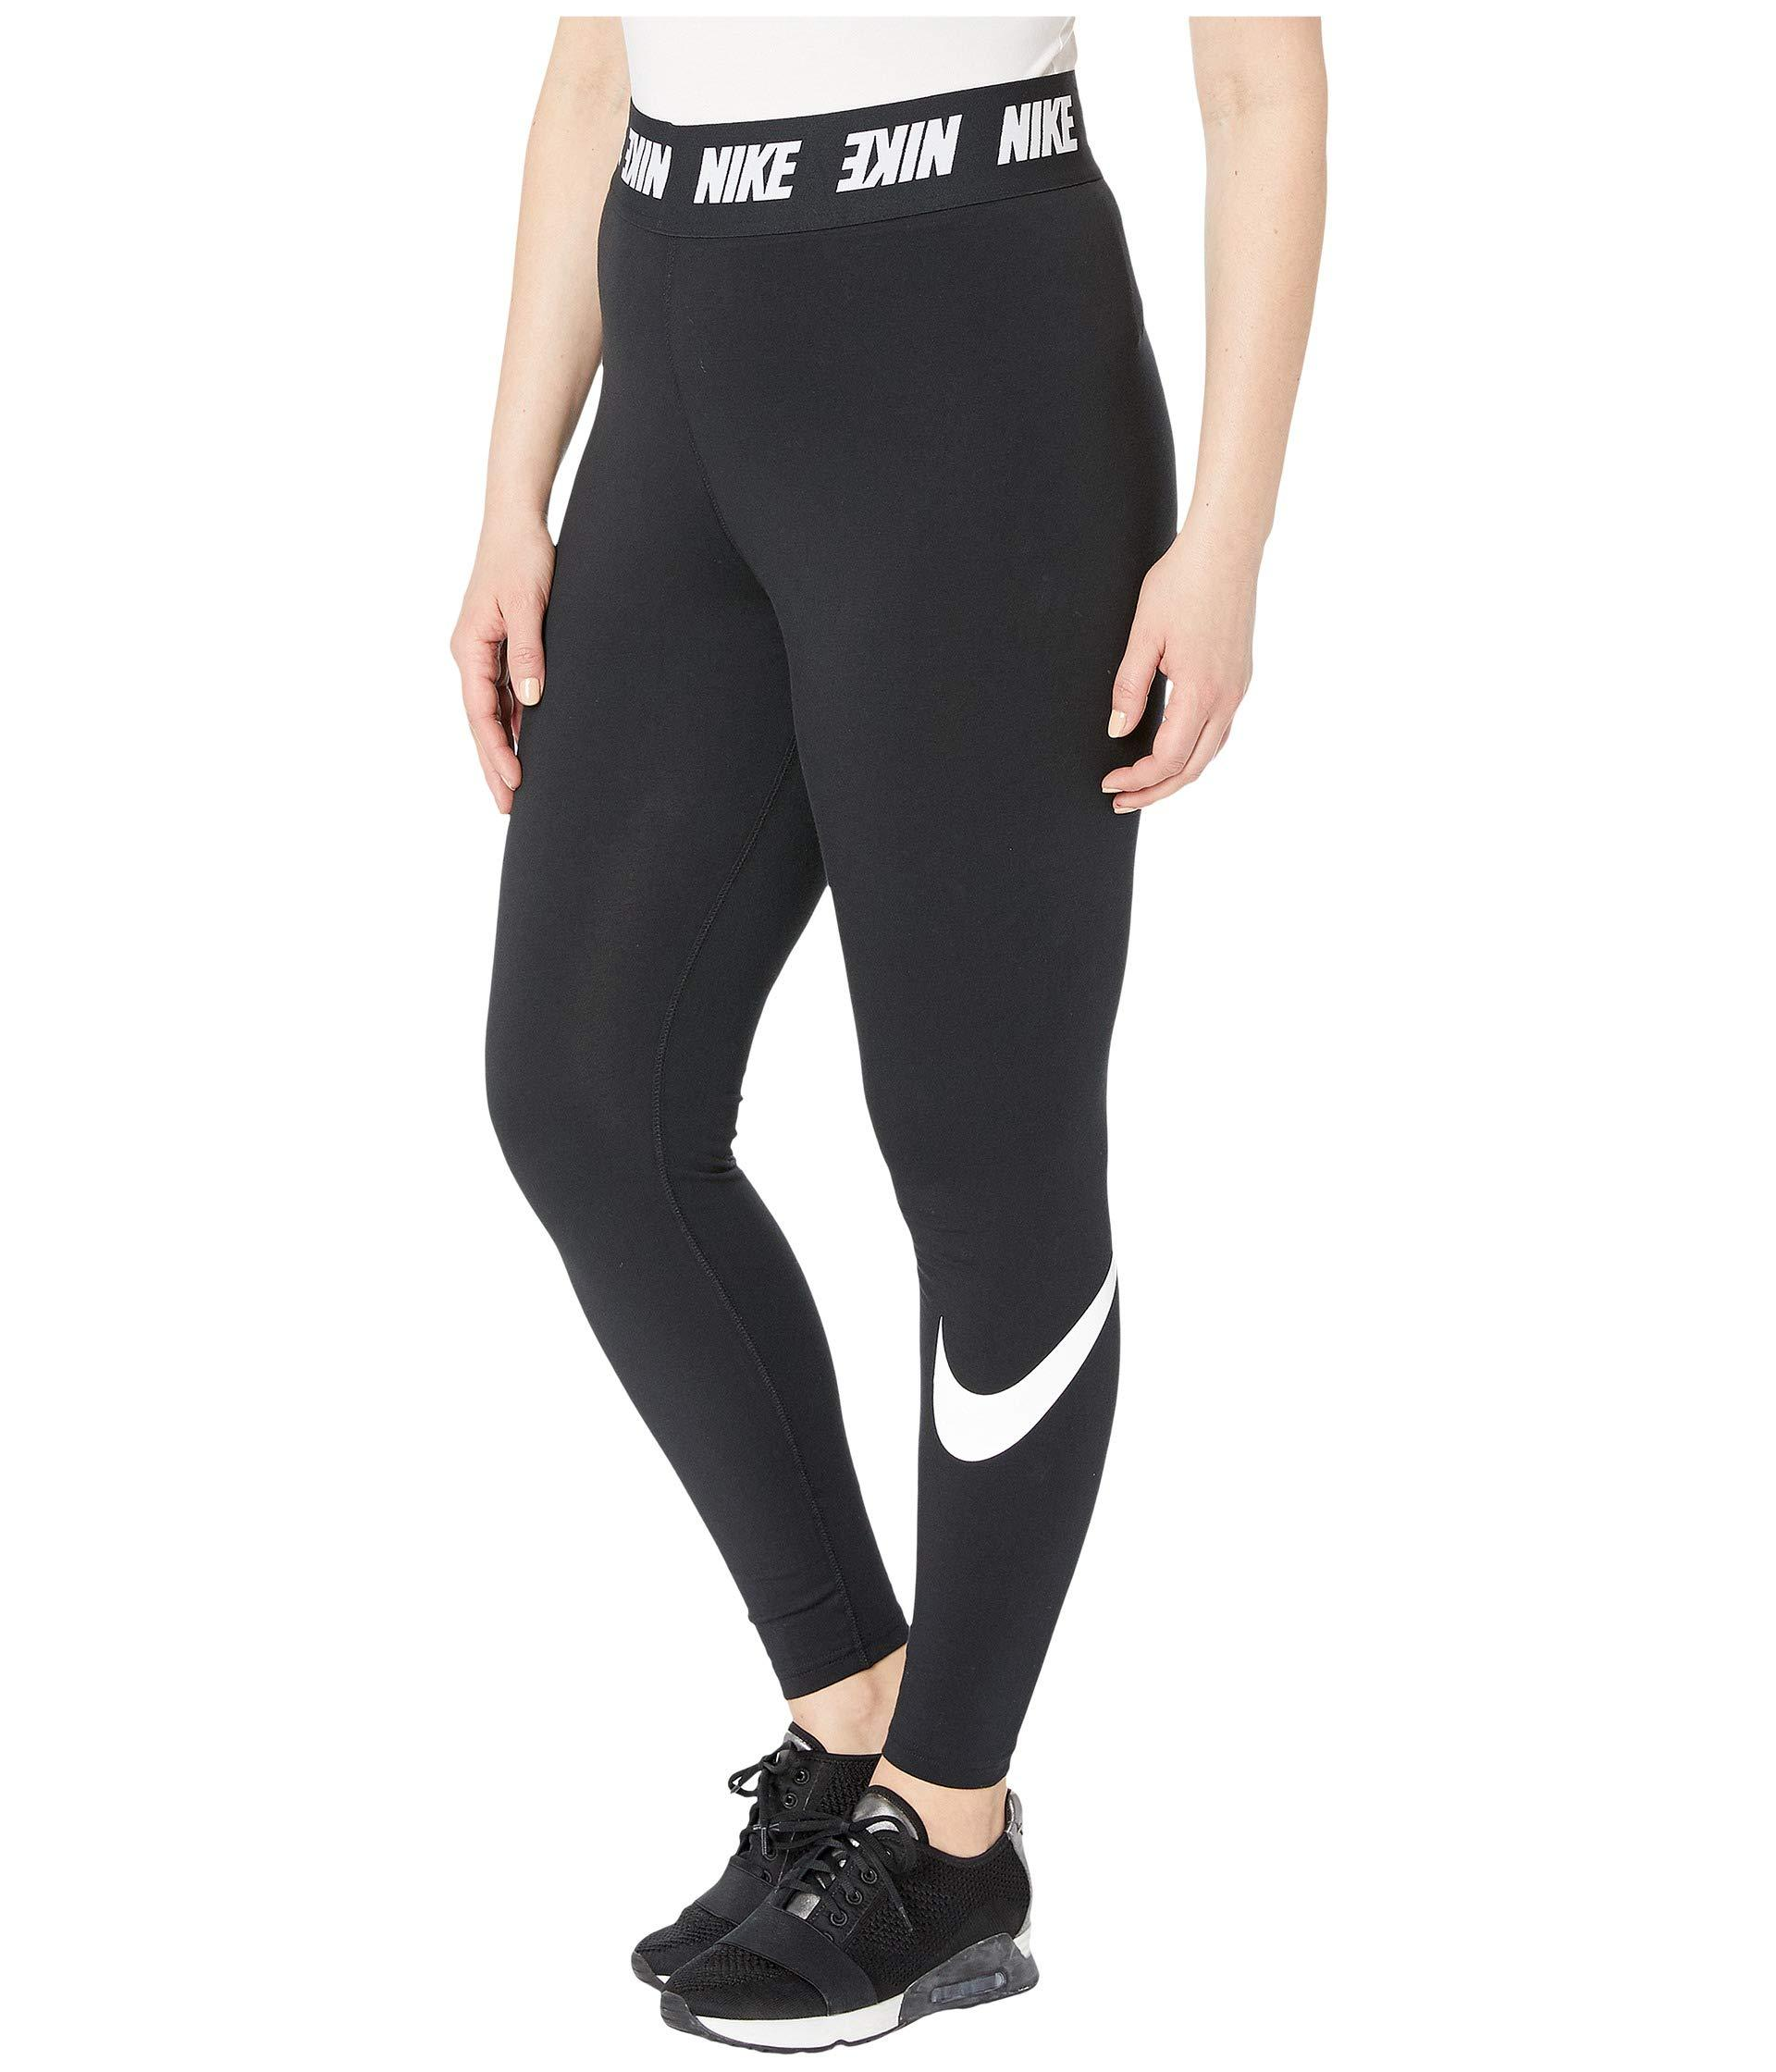 Lyst - Nike Plus Size Sportswear Leggings Club High-waist (black white)  Women s Casual Pants in Black 0eba4d699fa9